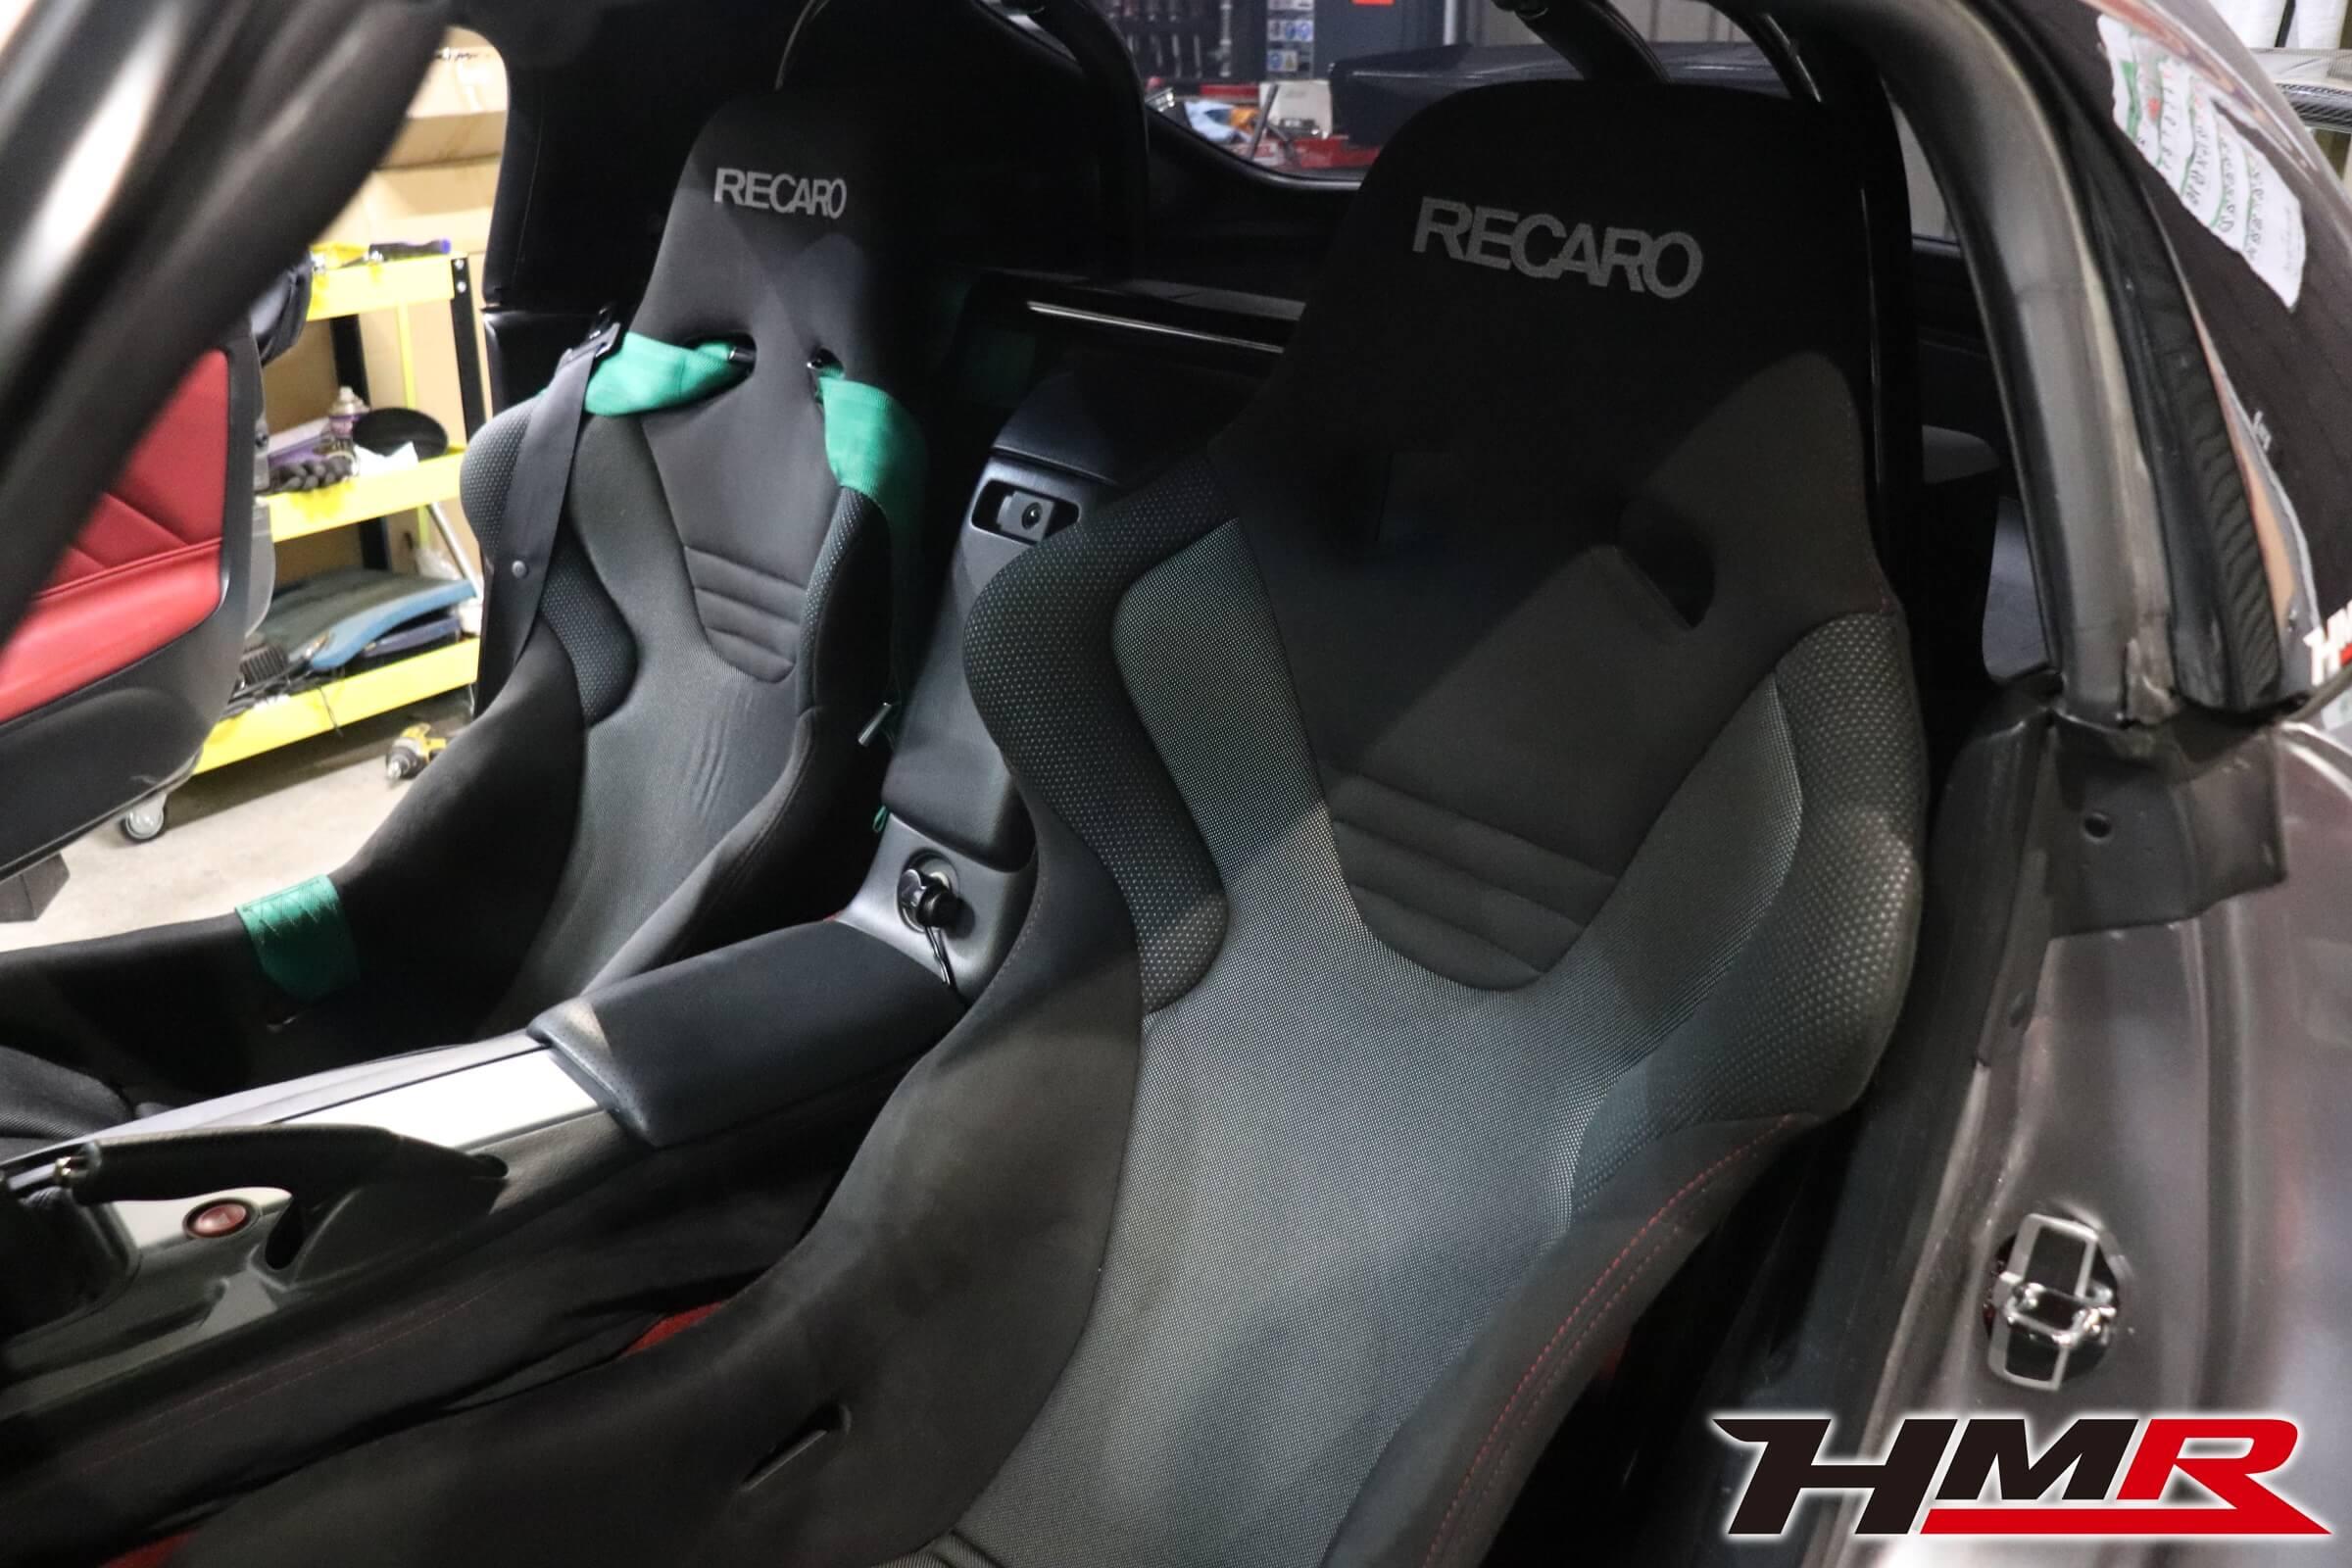 HMR S2000 助手席レカロシート交換